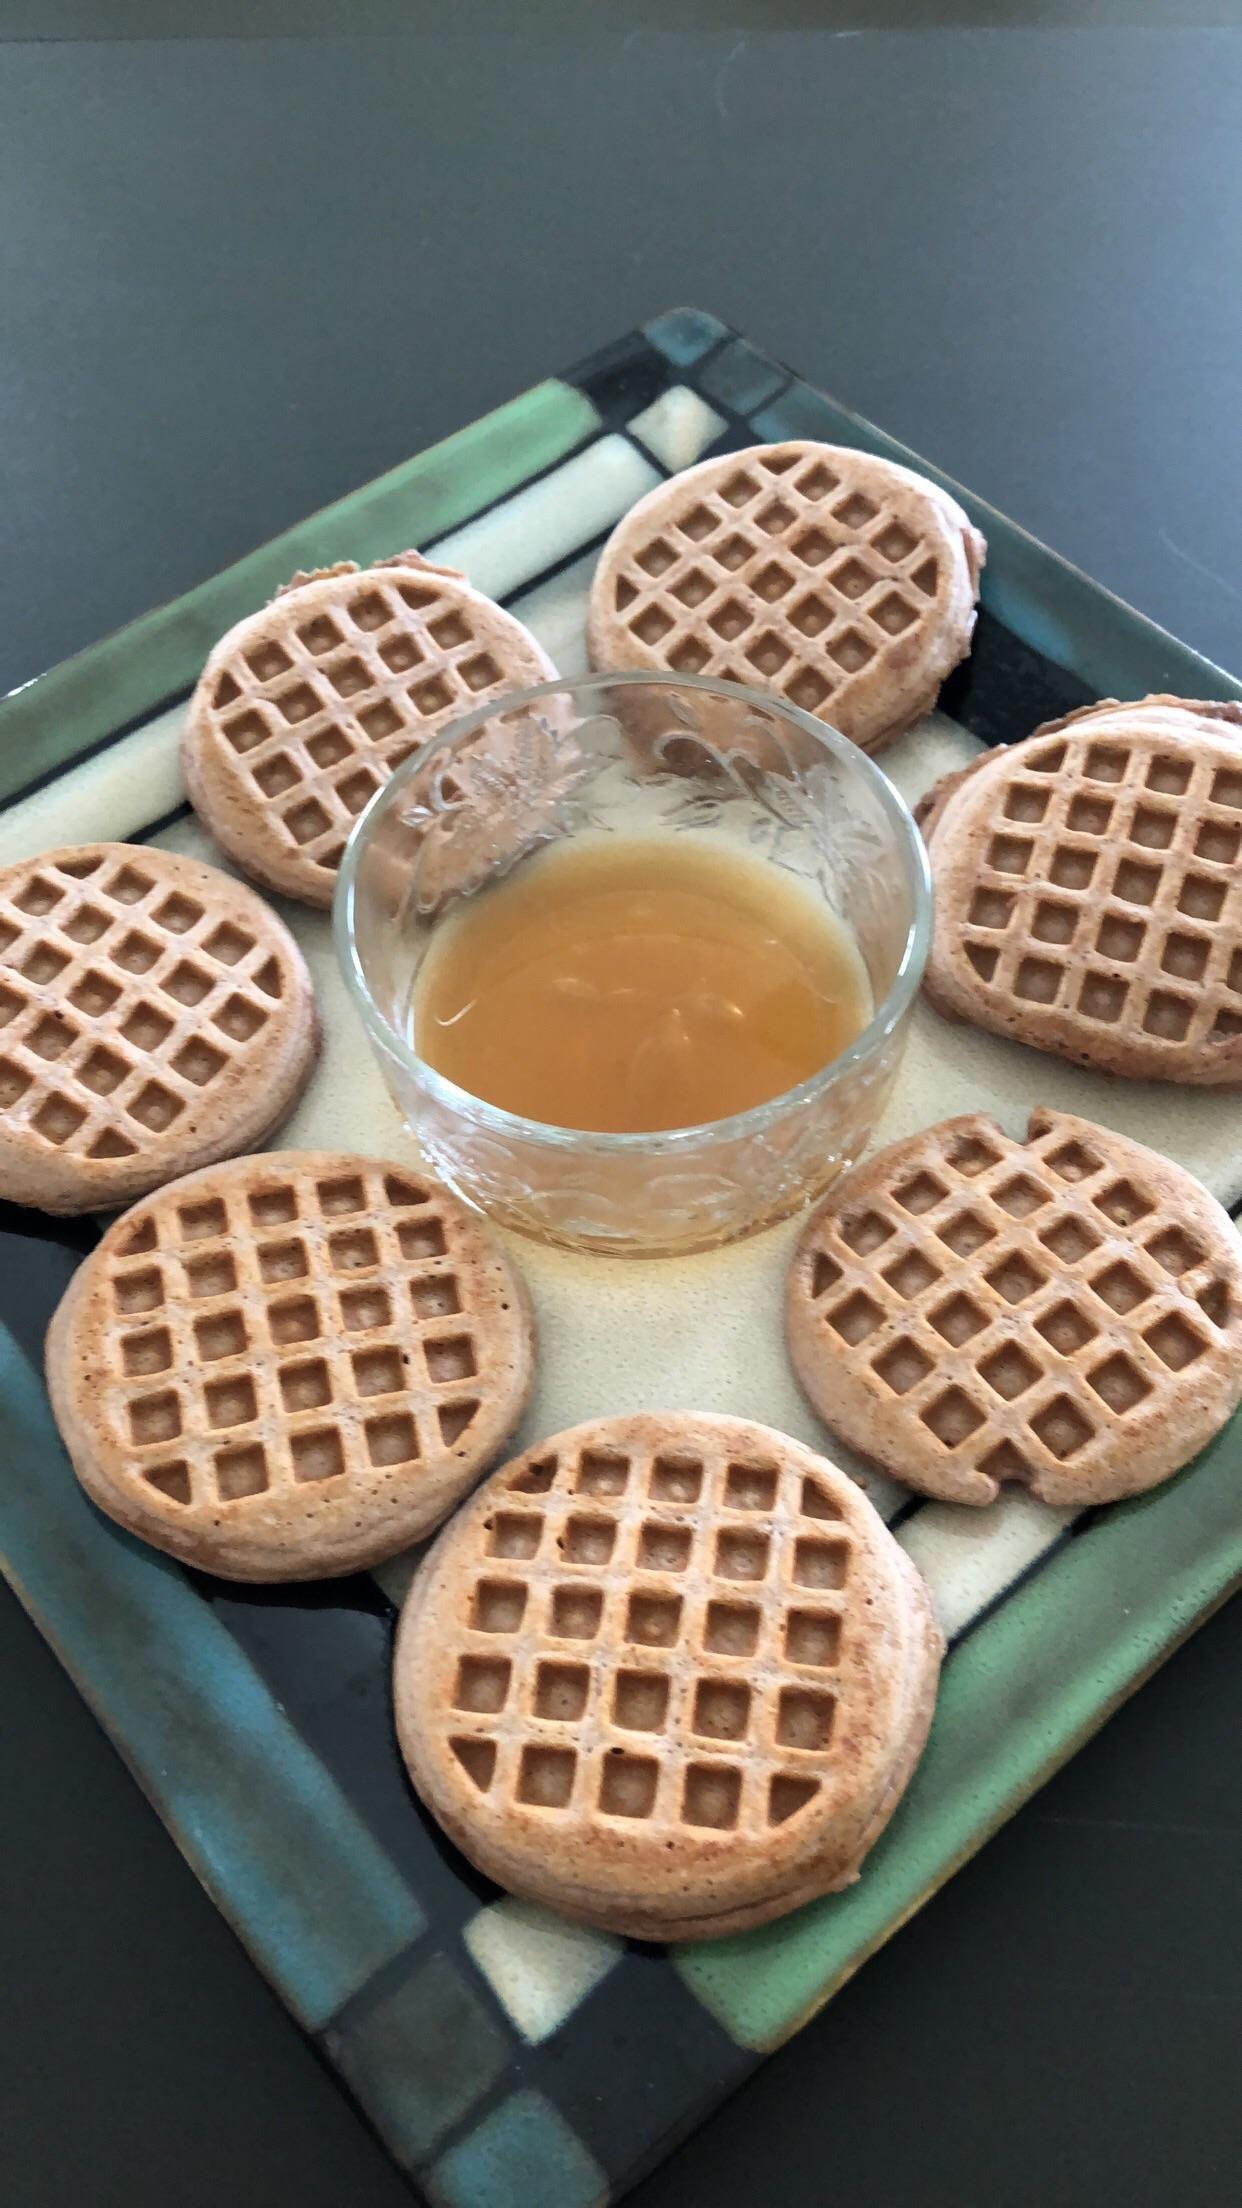 Kodiak Cake & Protein mini Waffles for Saturday morning brunch 310 calories